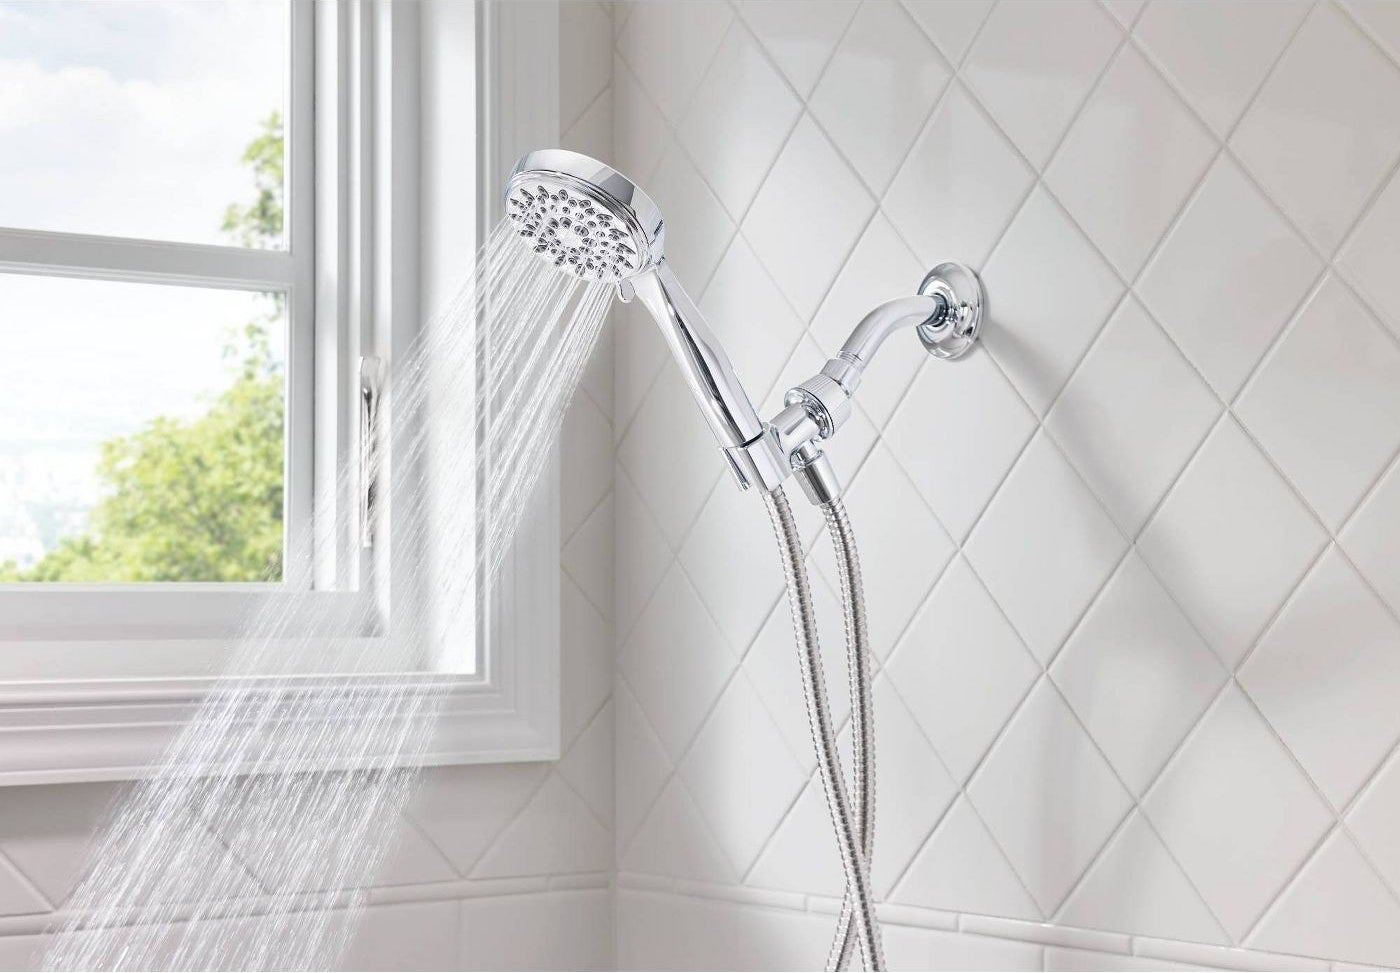 Chrome showerhead inside a white shower